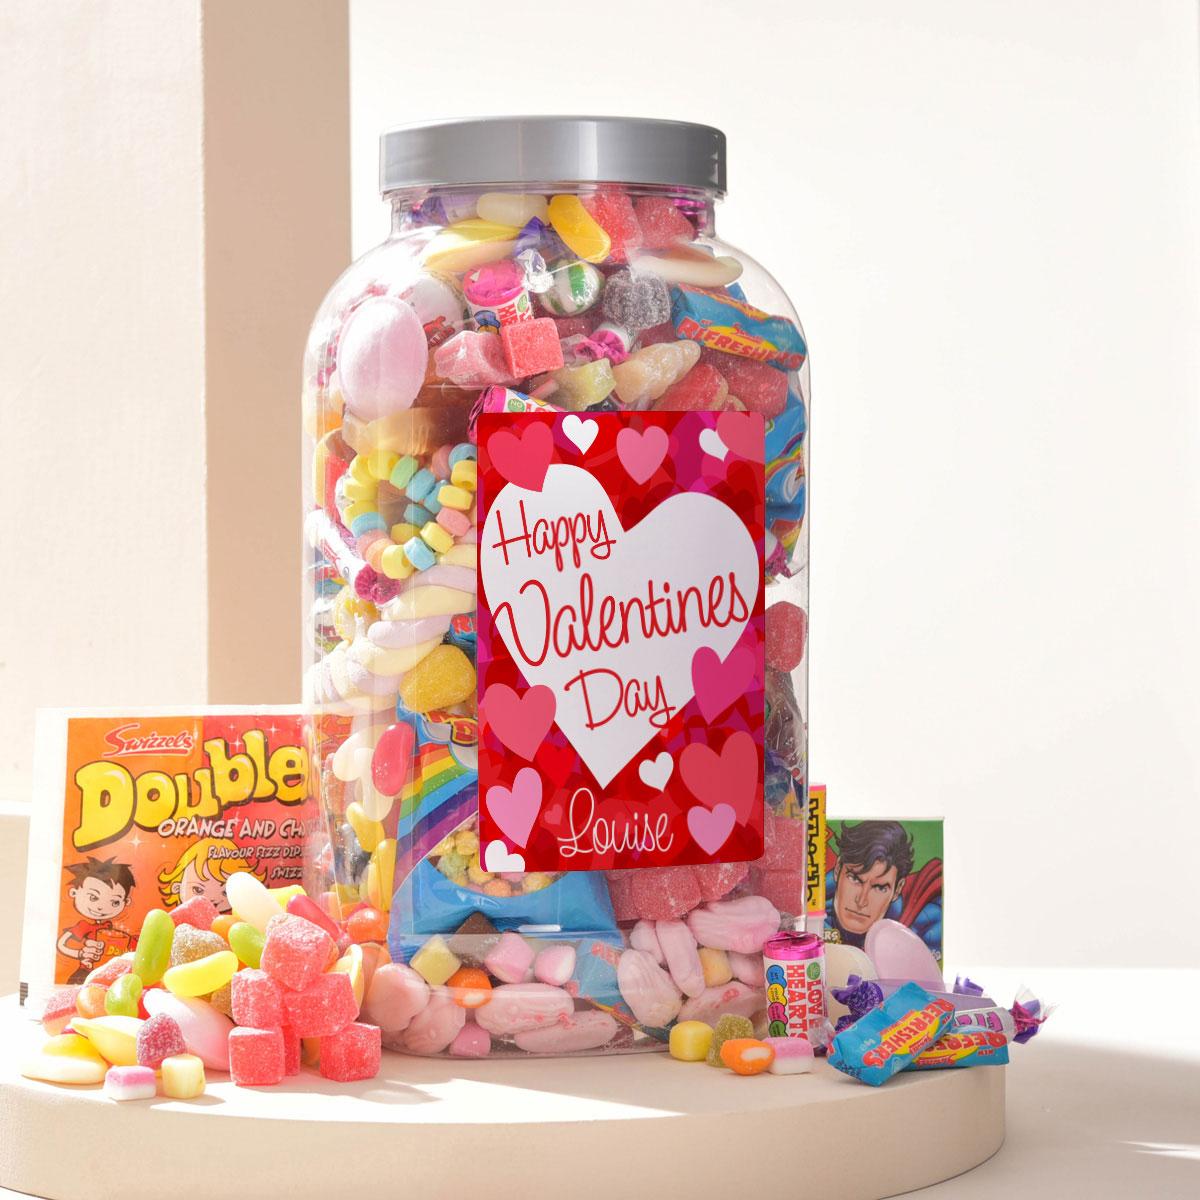 Personalised Retro Sweet Jar  Happy Valentines Day